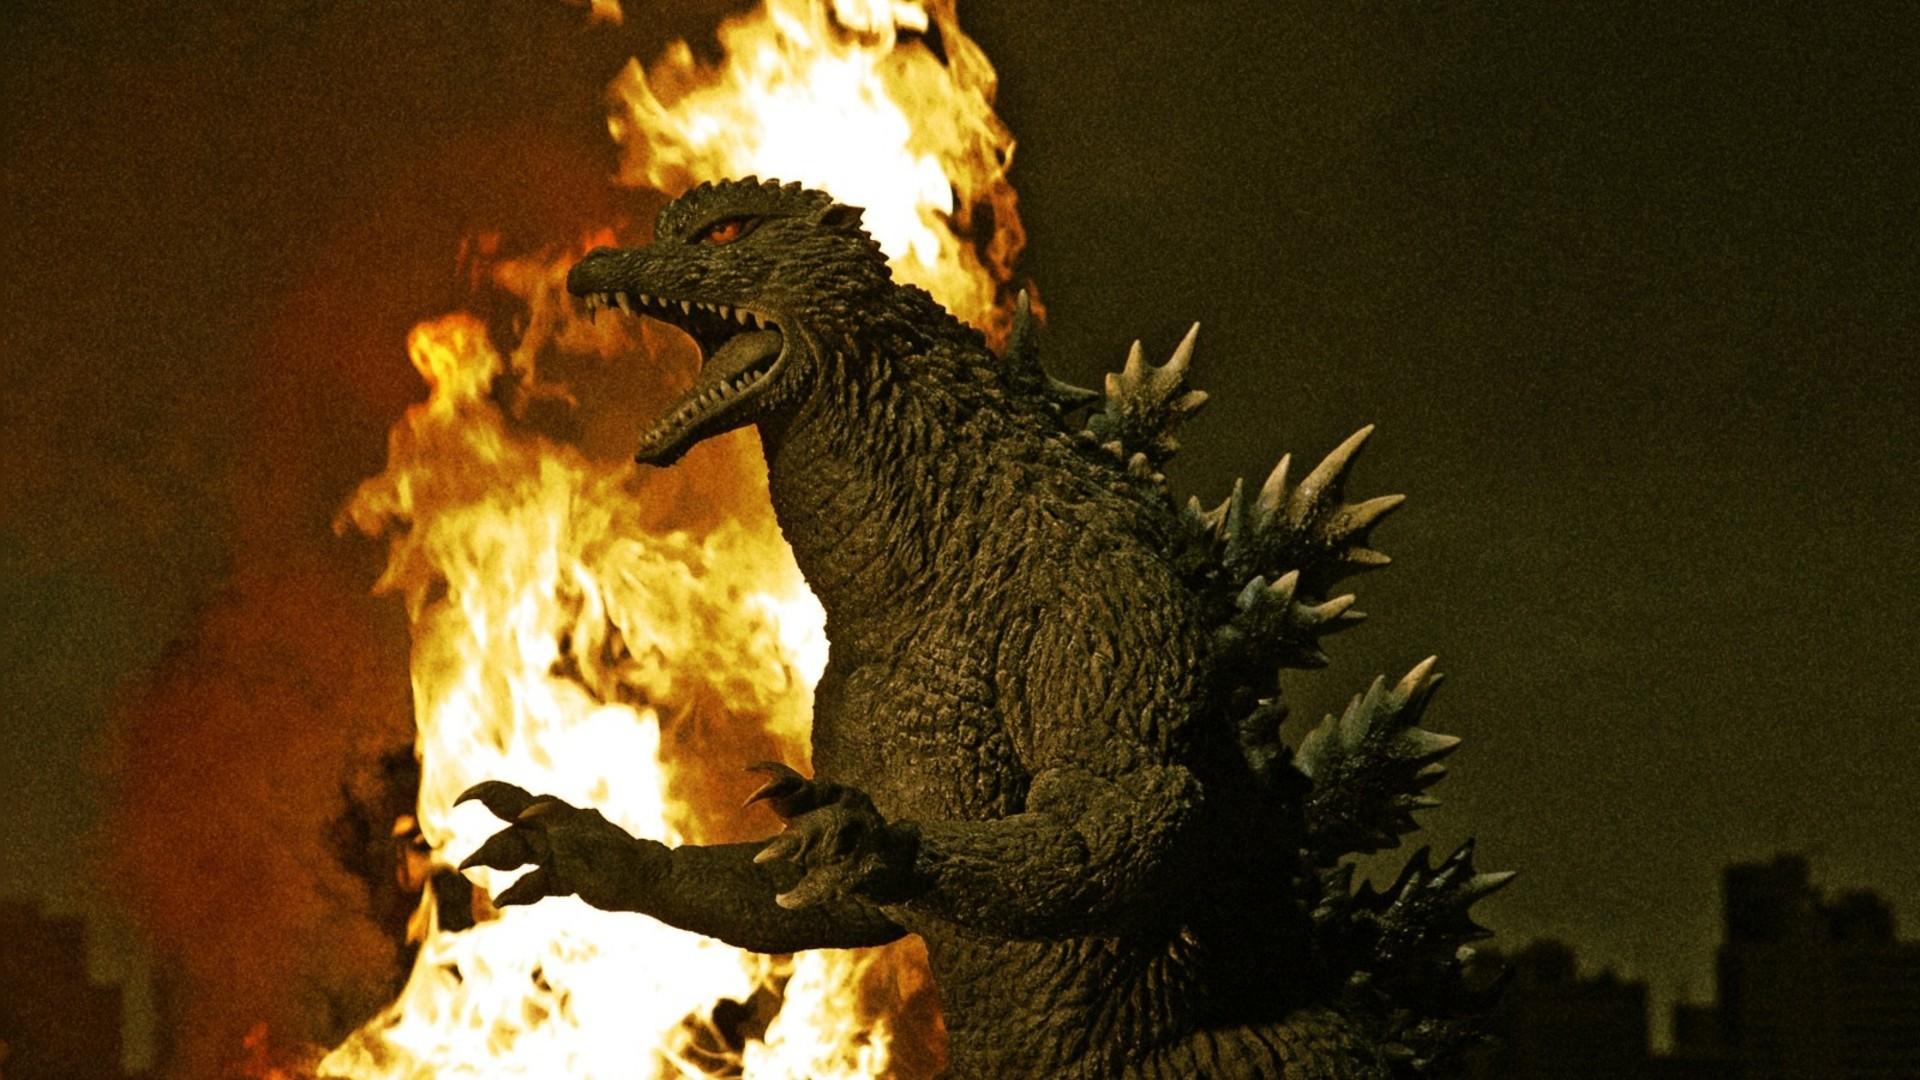 King Kong Vs Godzilla HD Wide Wallpaper for Widescreen (70 Wallpapers) – HD  Wallpapers